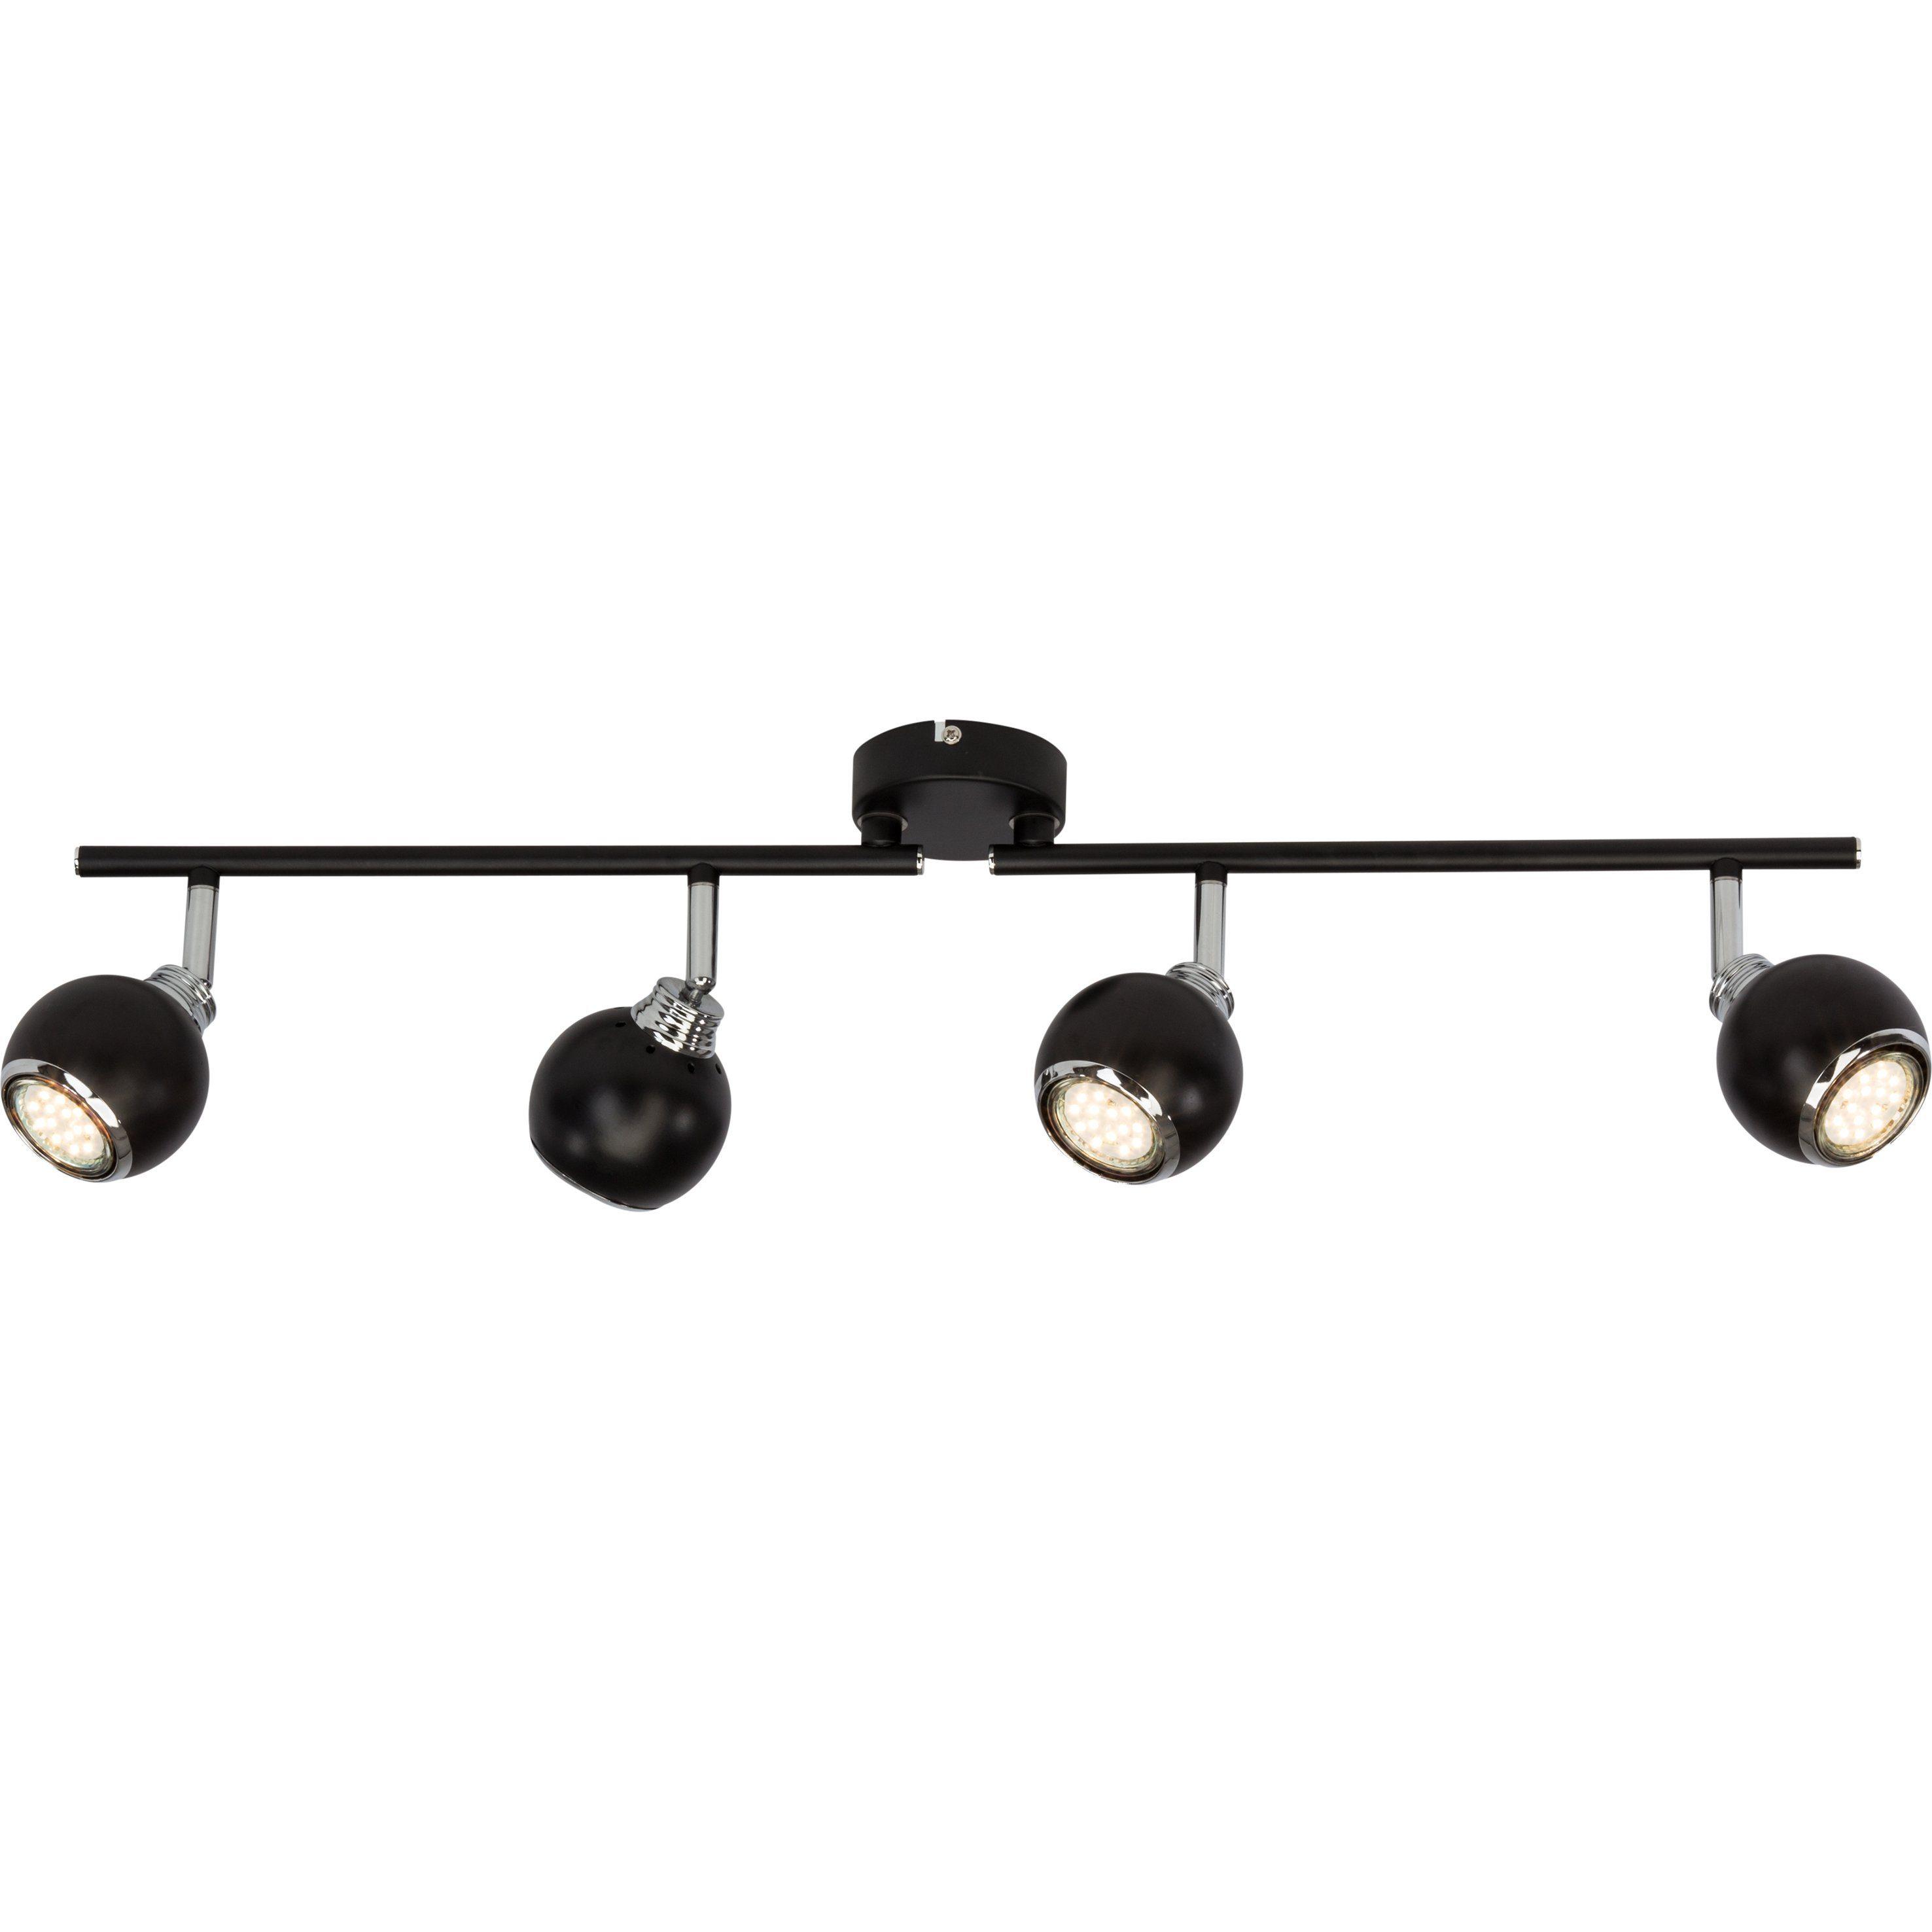 Brilliant Leuchten Ina LED Spotrohr, 4-flammig schwarz/chrom